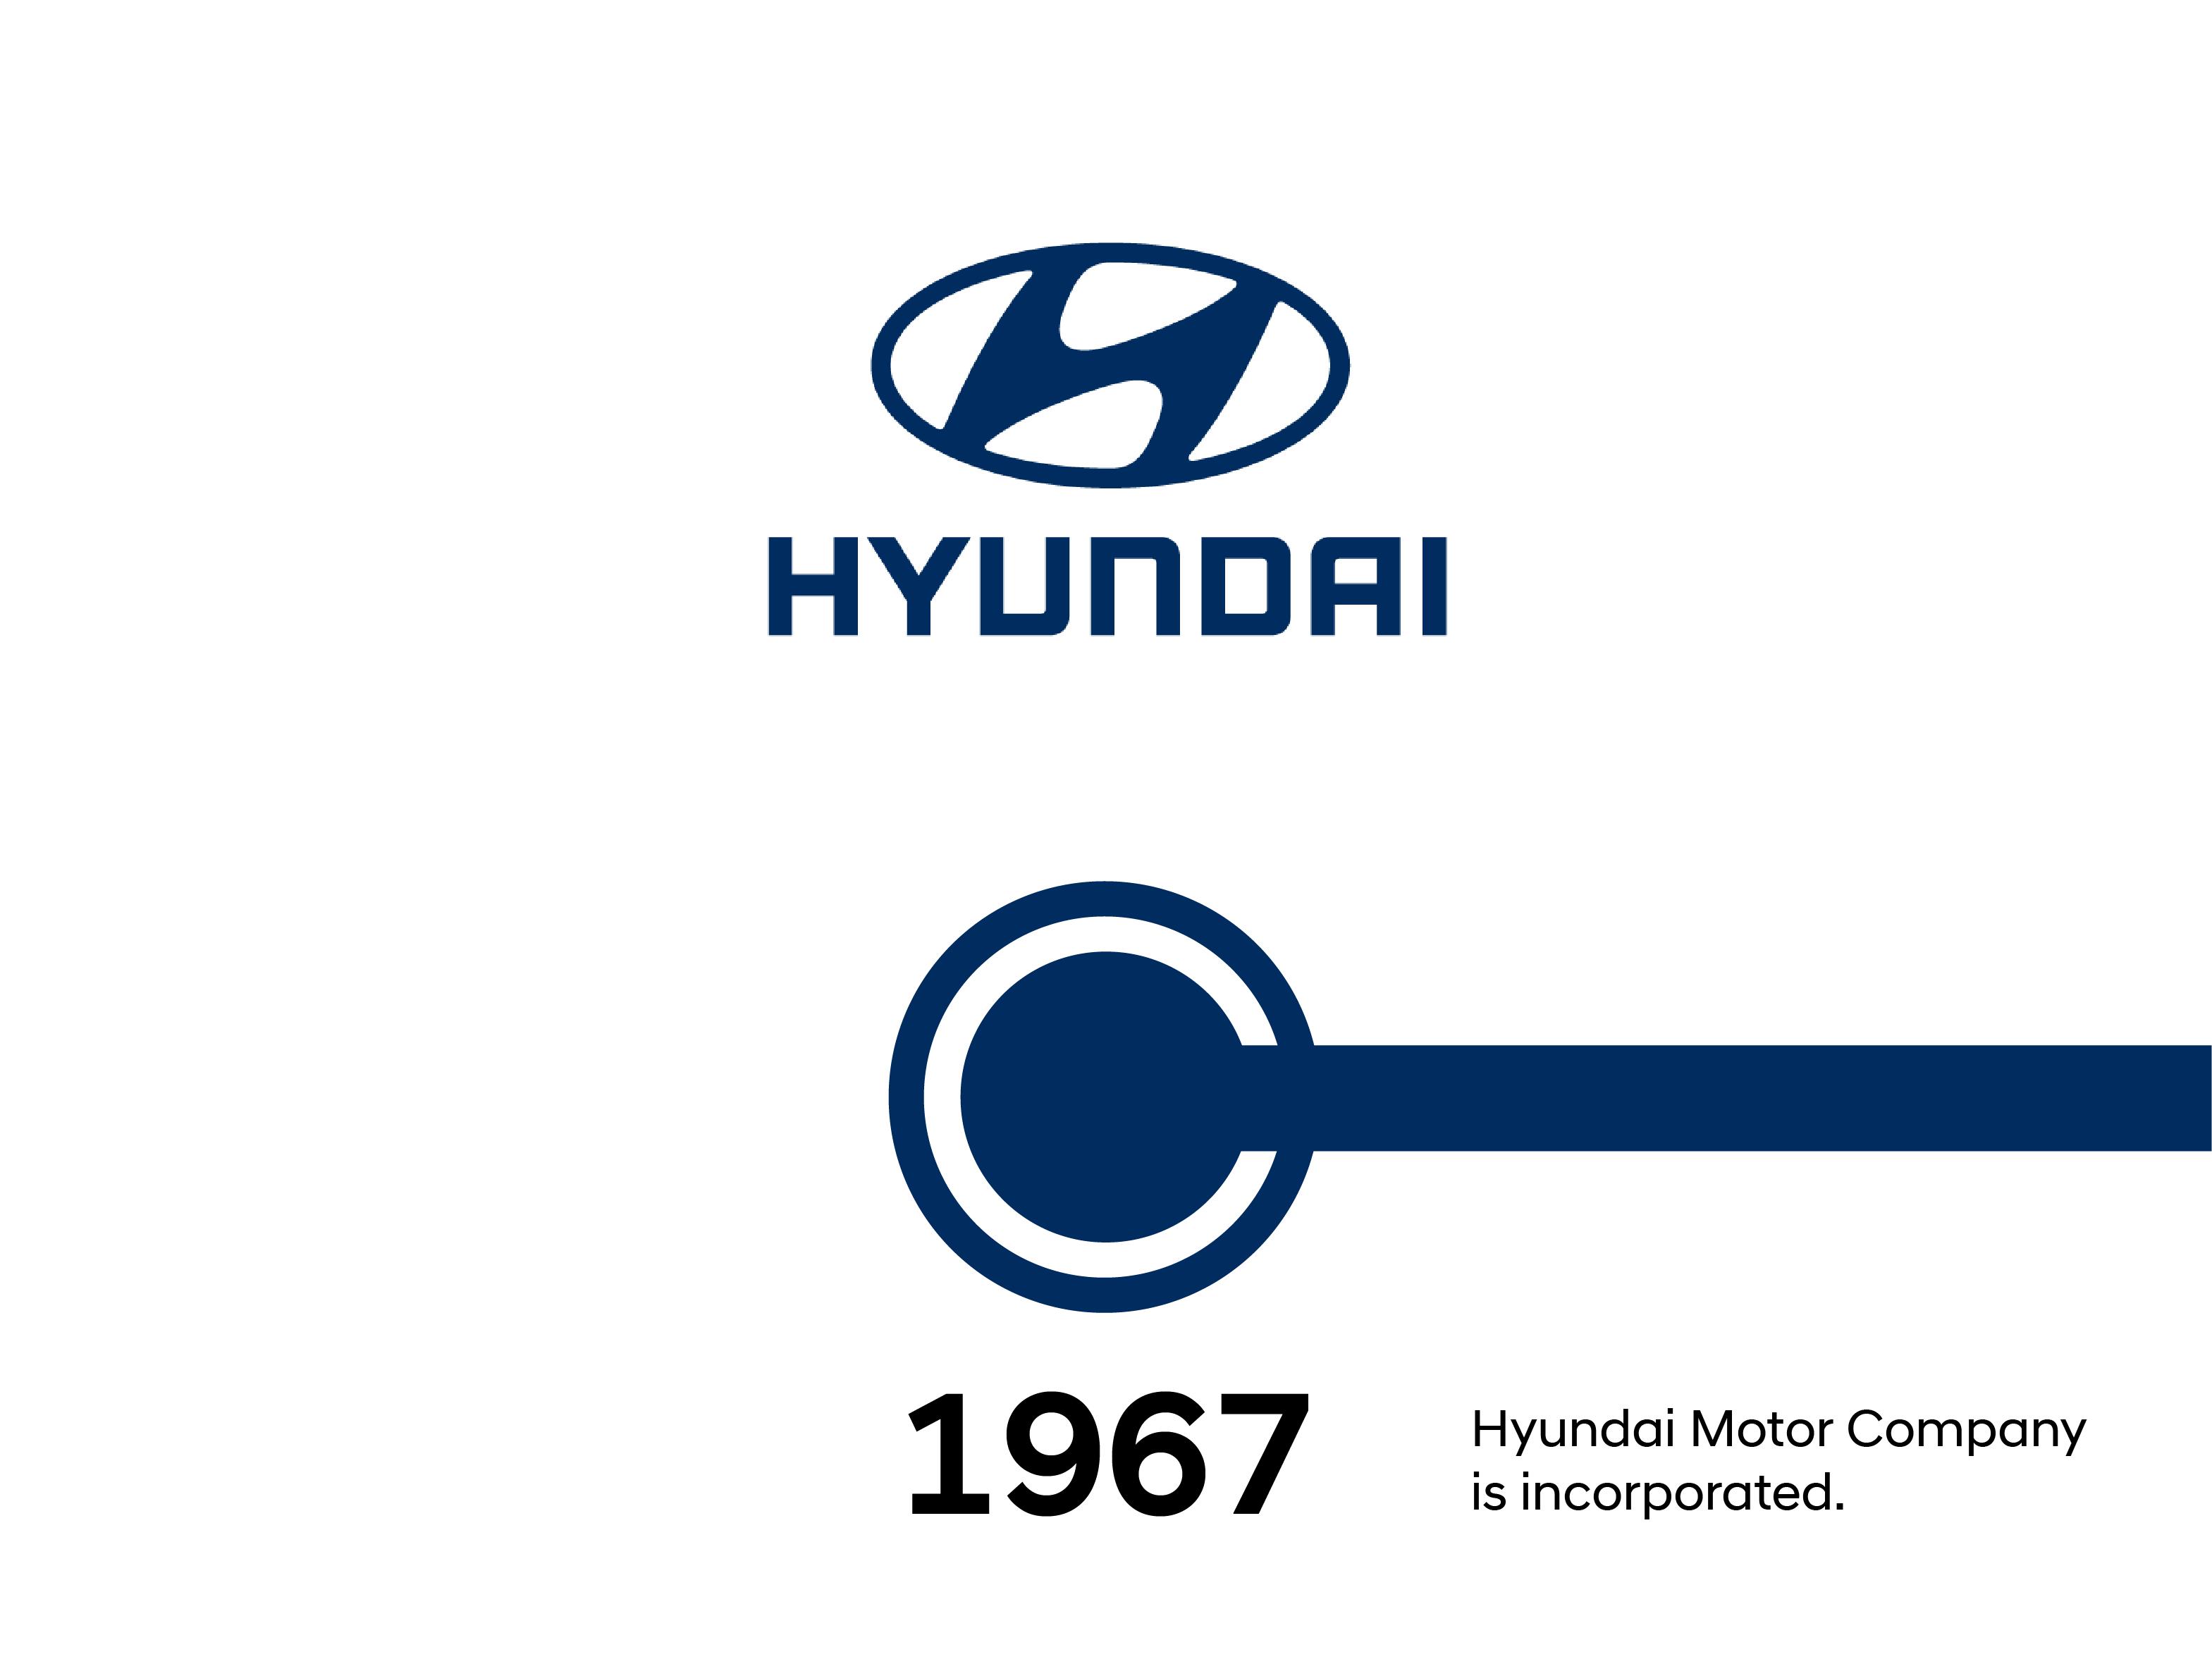 Hyundai Timeline - slide 1